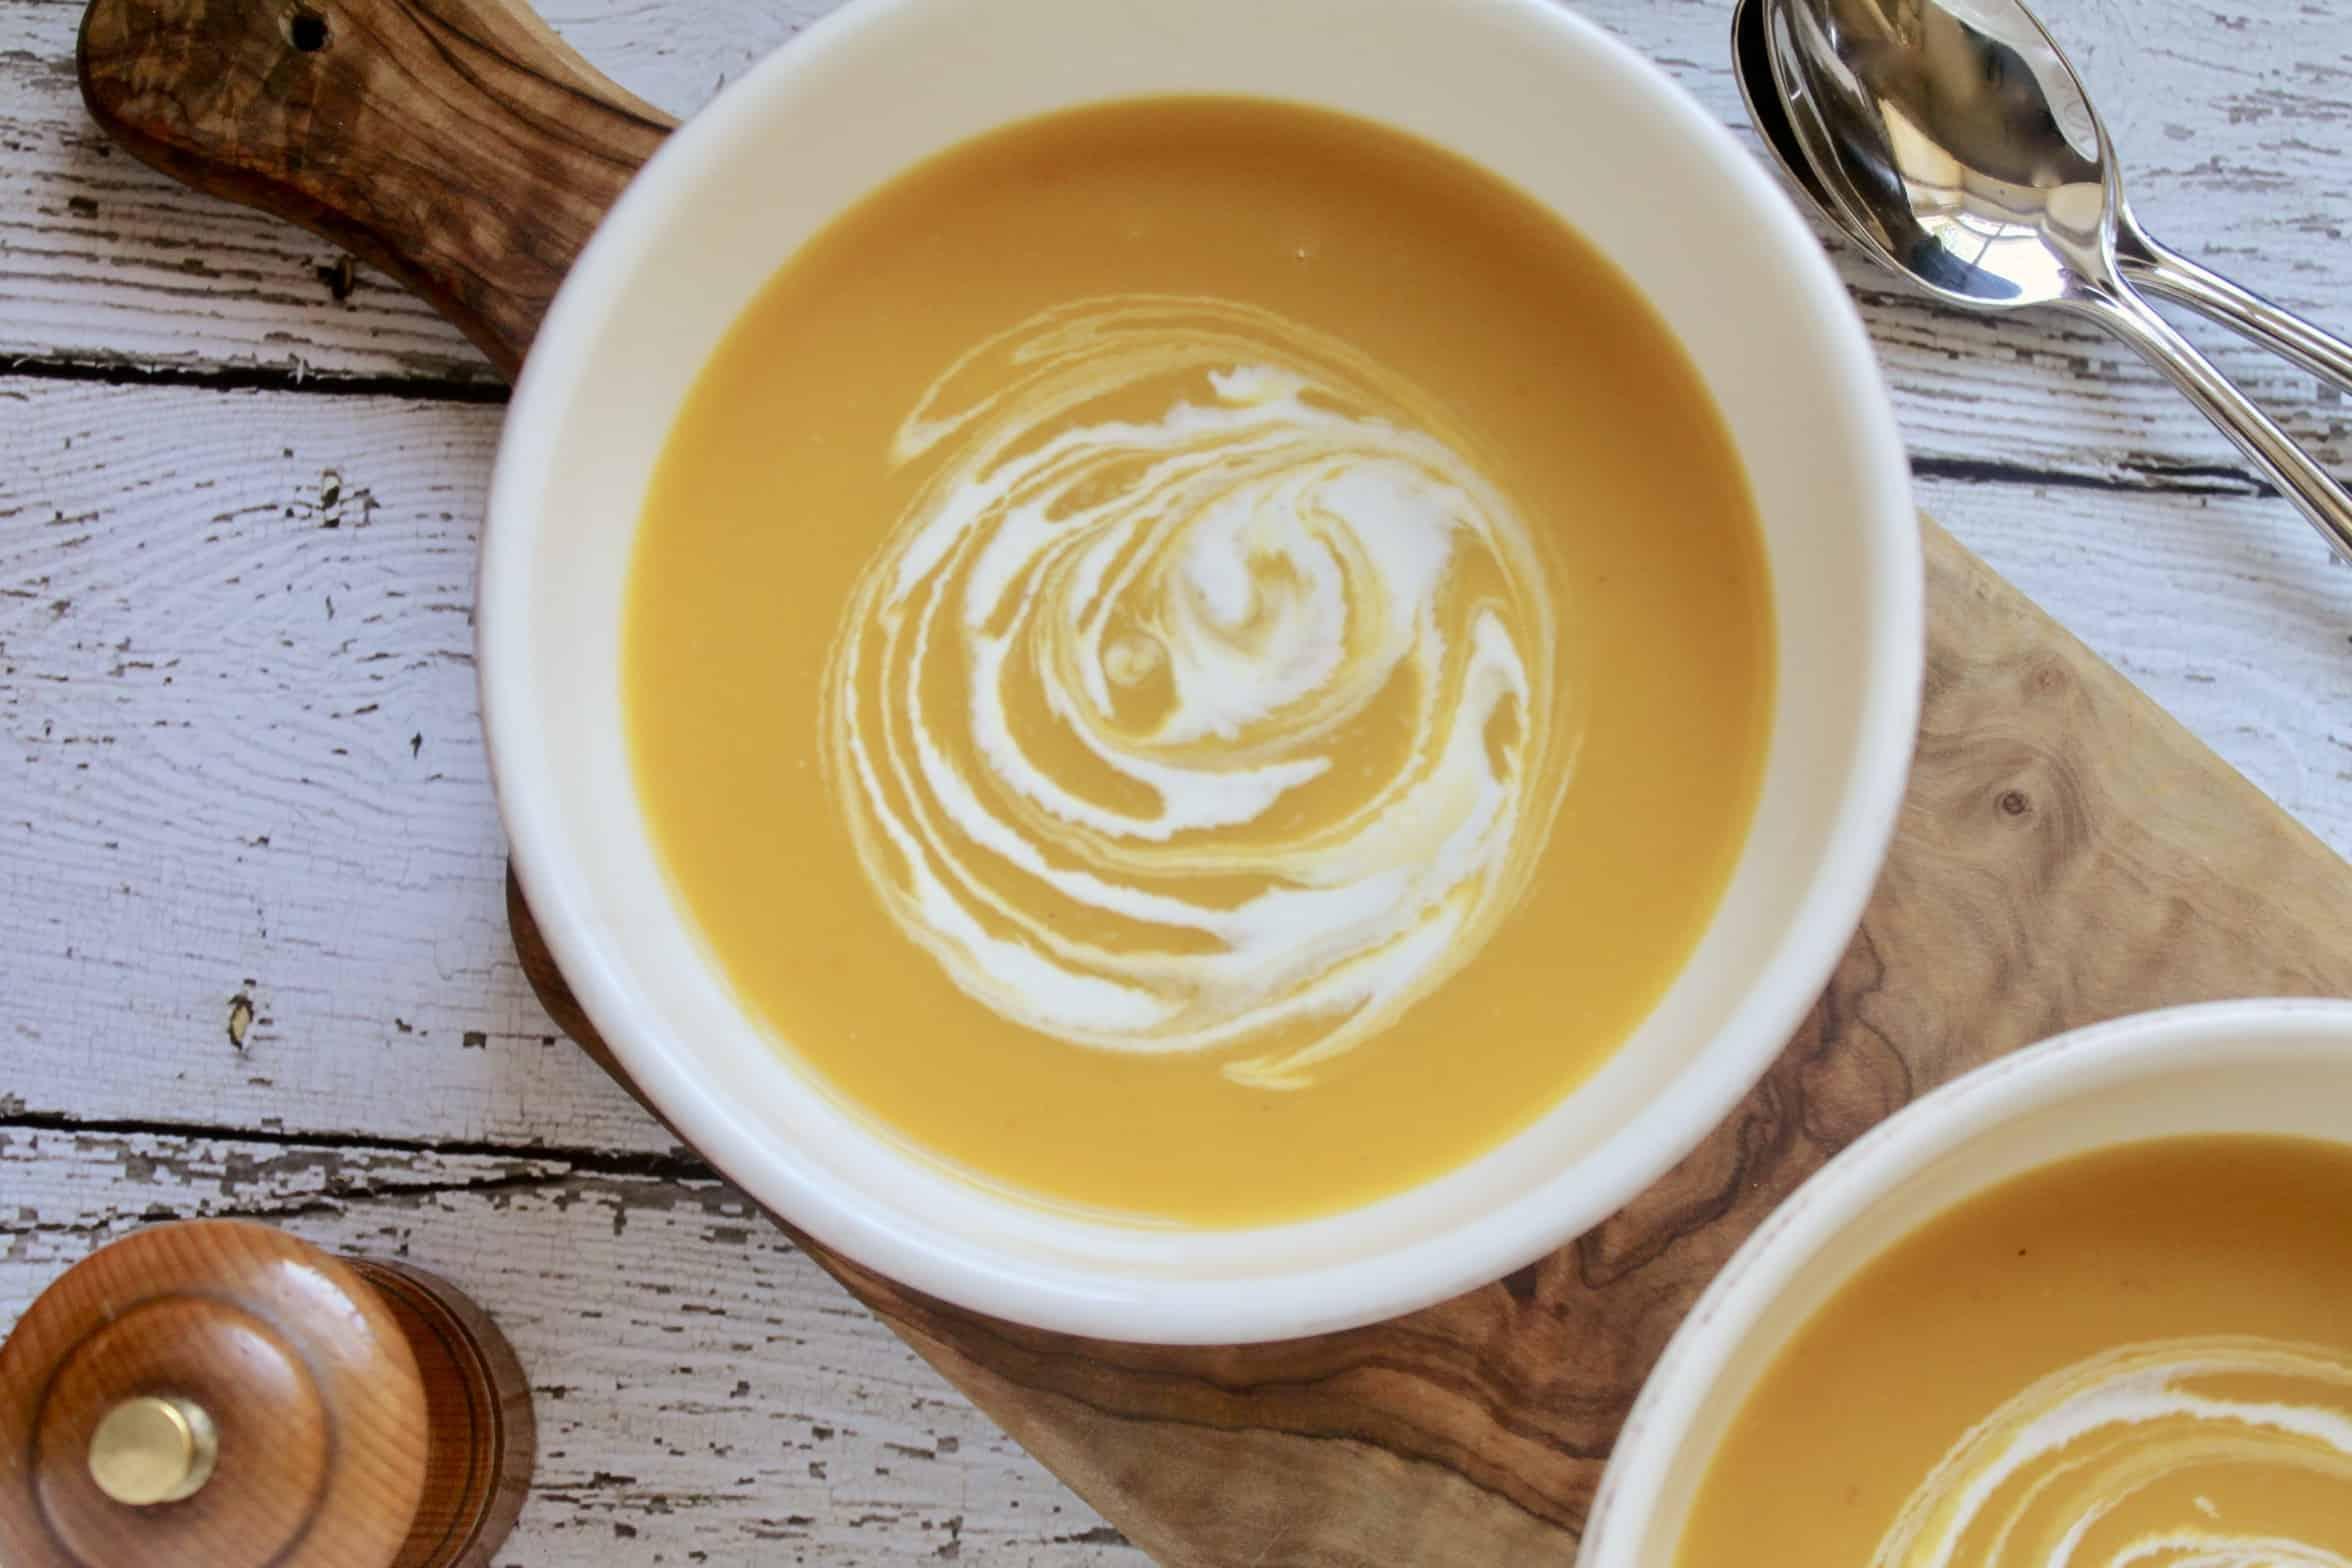 soup with cream swirl